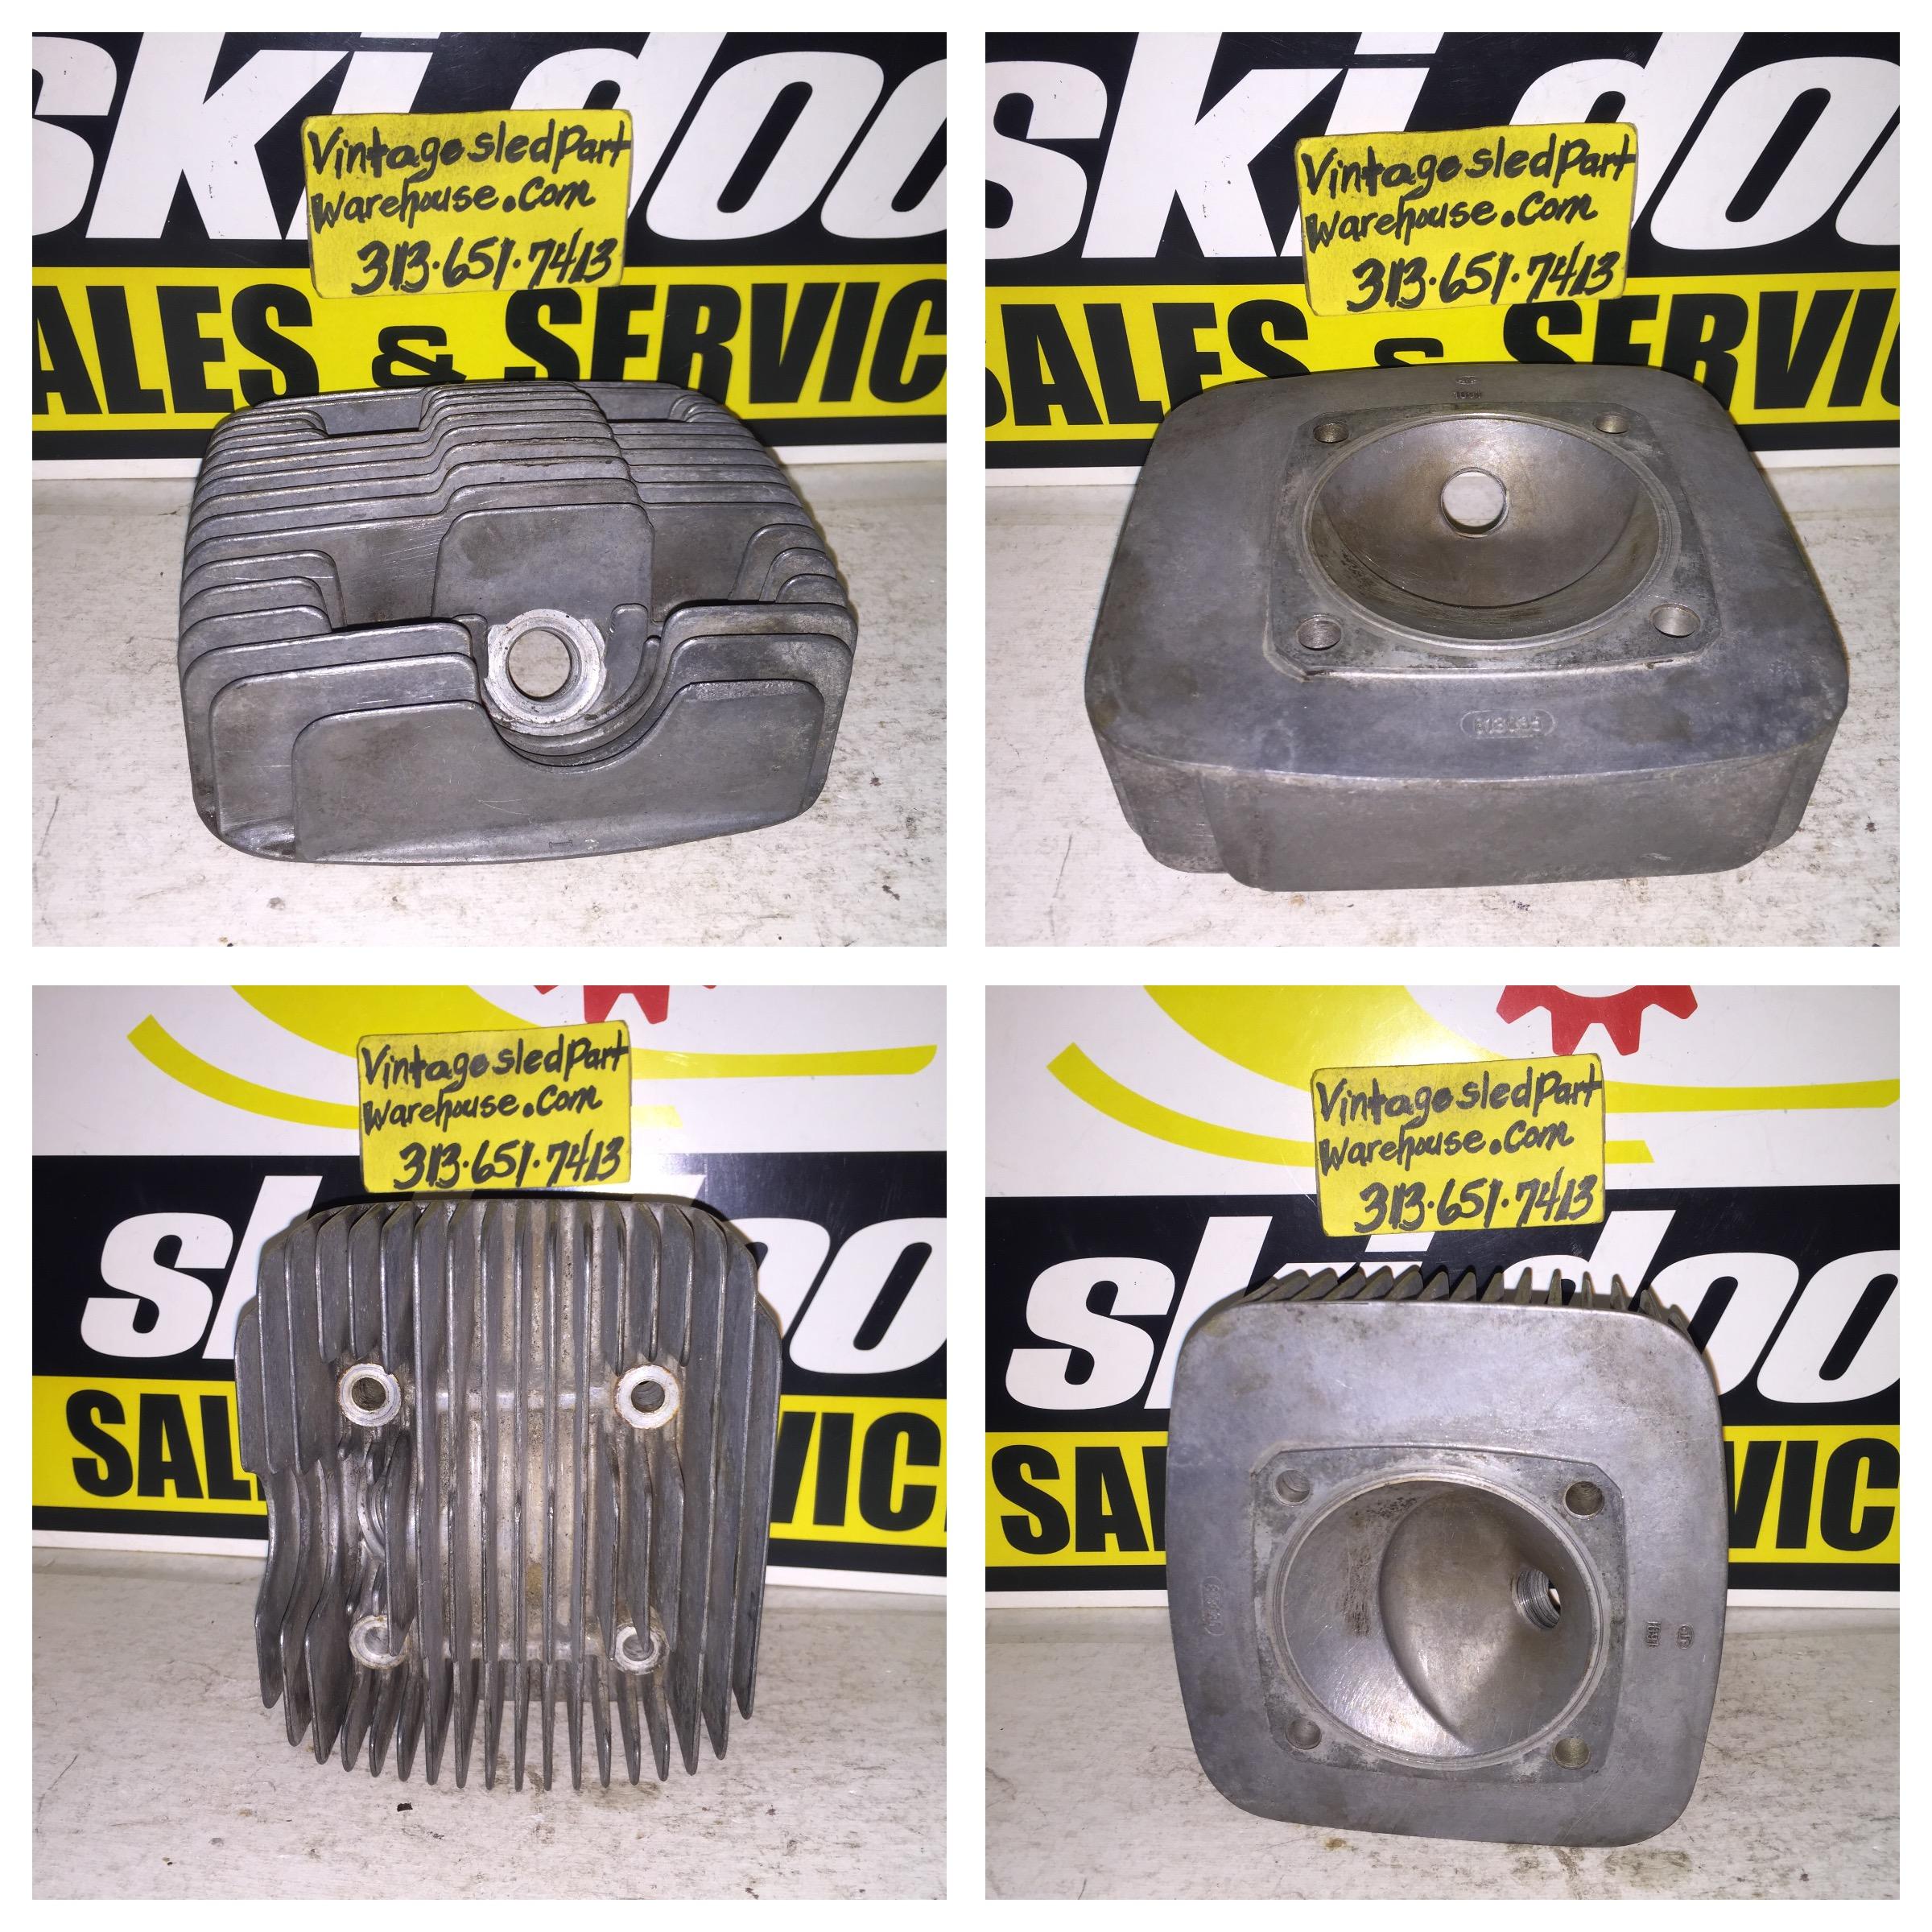 snowmobile engines vintage ski doo rotax sachs hirth jlo wankel rh vintagesledpartwarehouse com Rotax 400 Engine Rotax 600 Engine